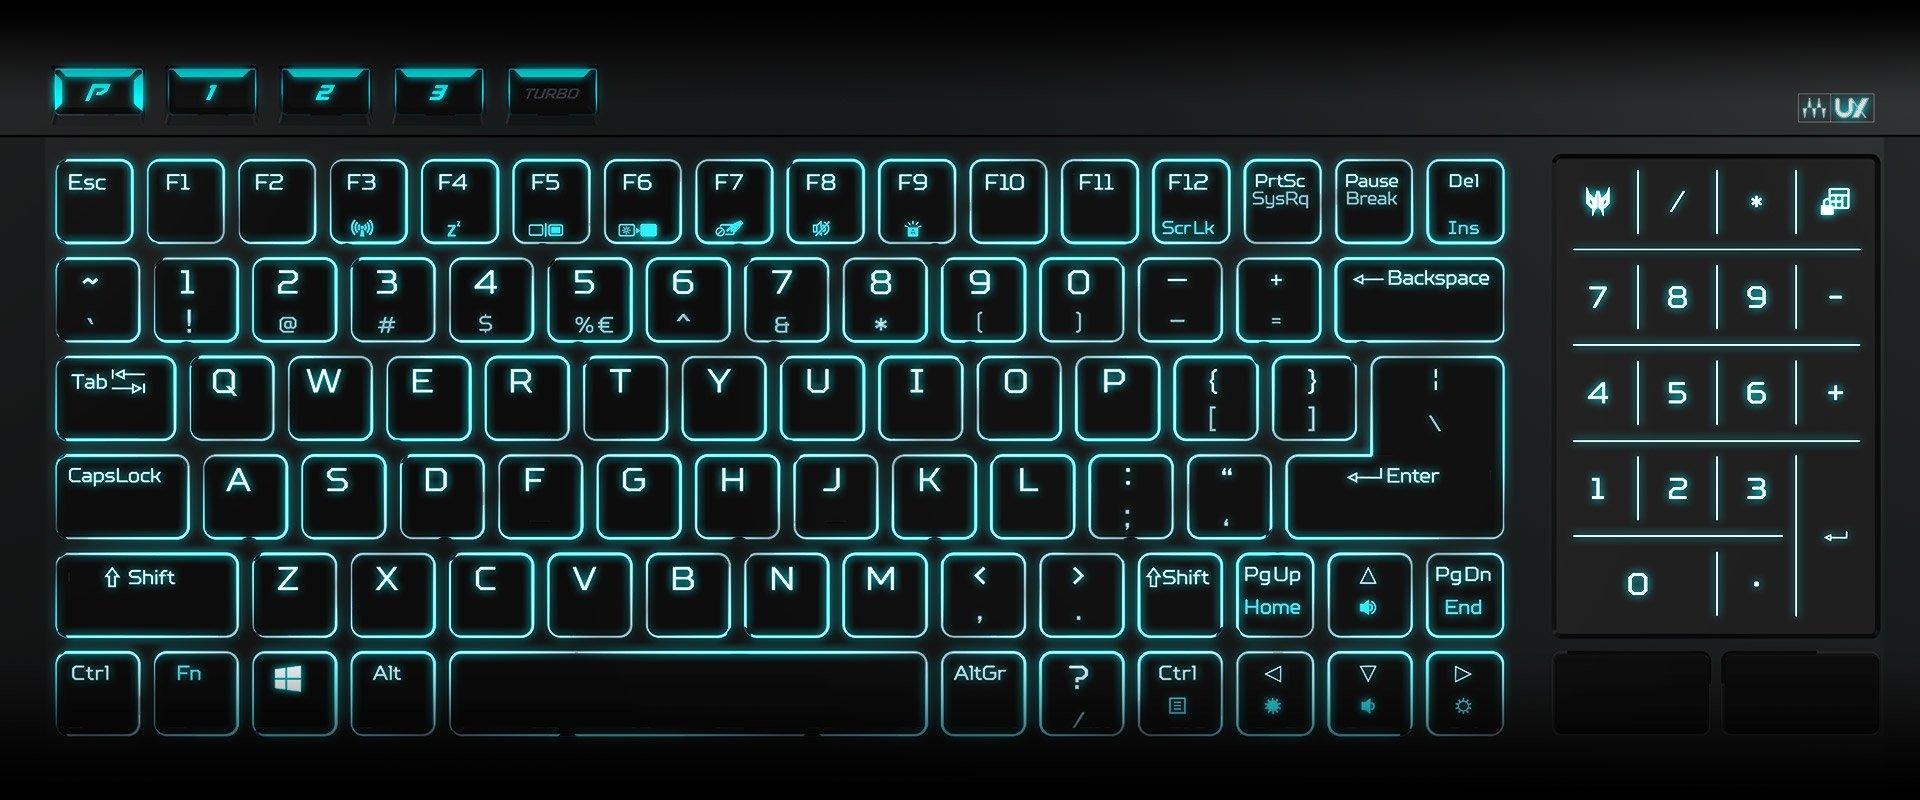 laptop Predator Triton 900